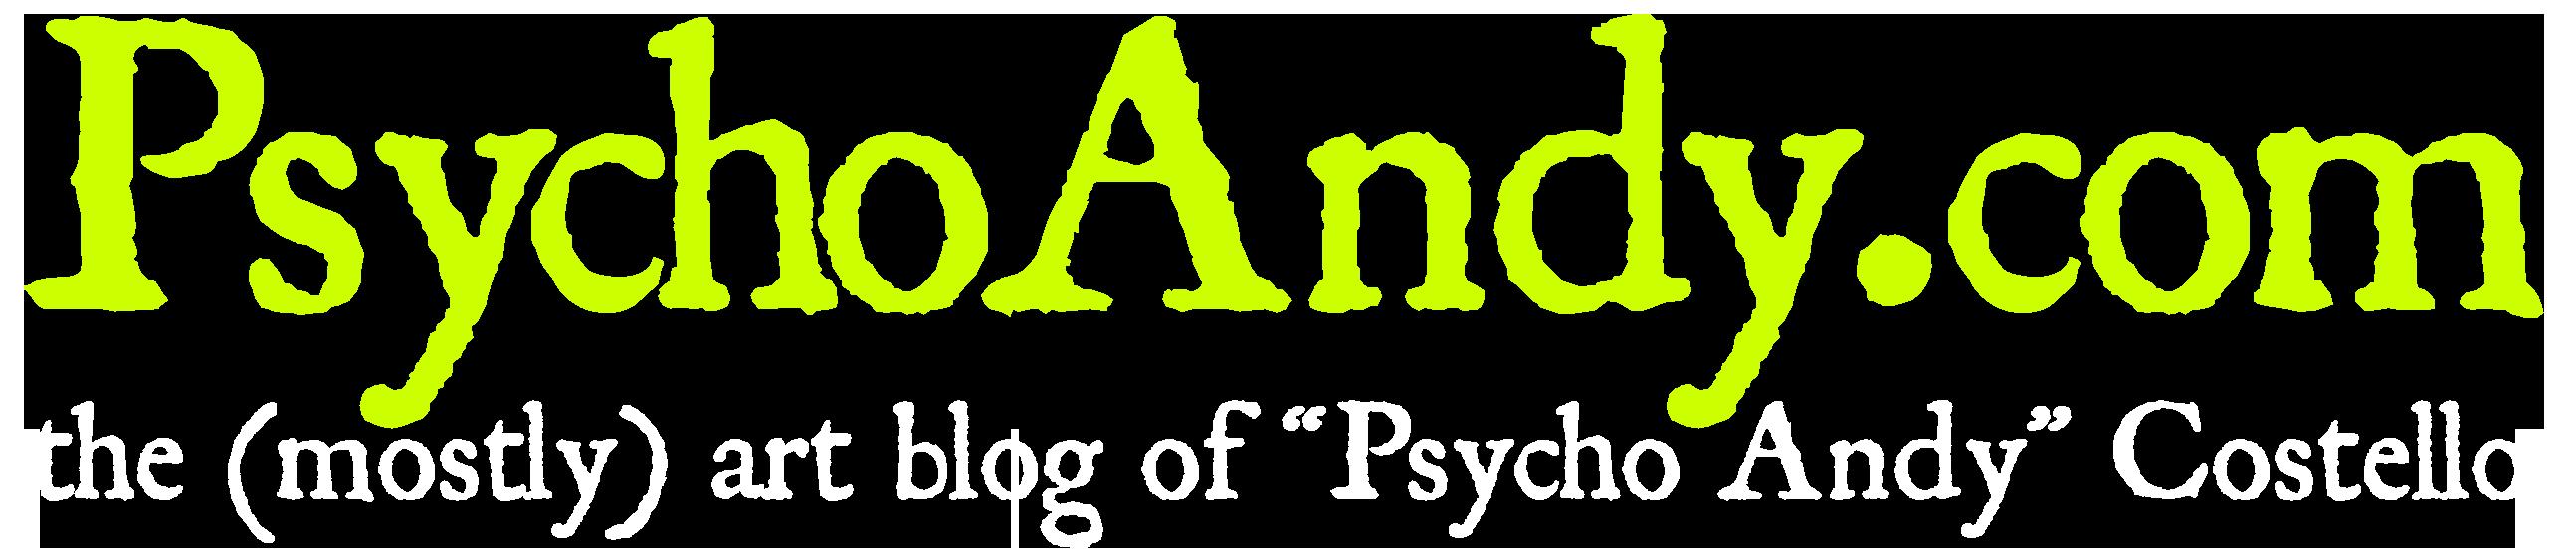 PsychoAndy.com